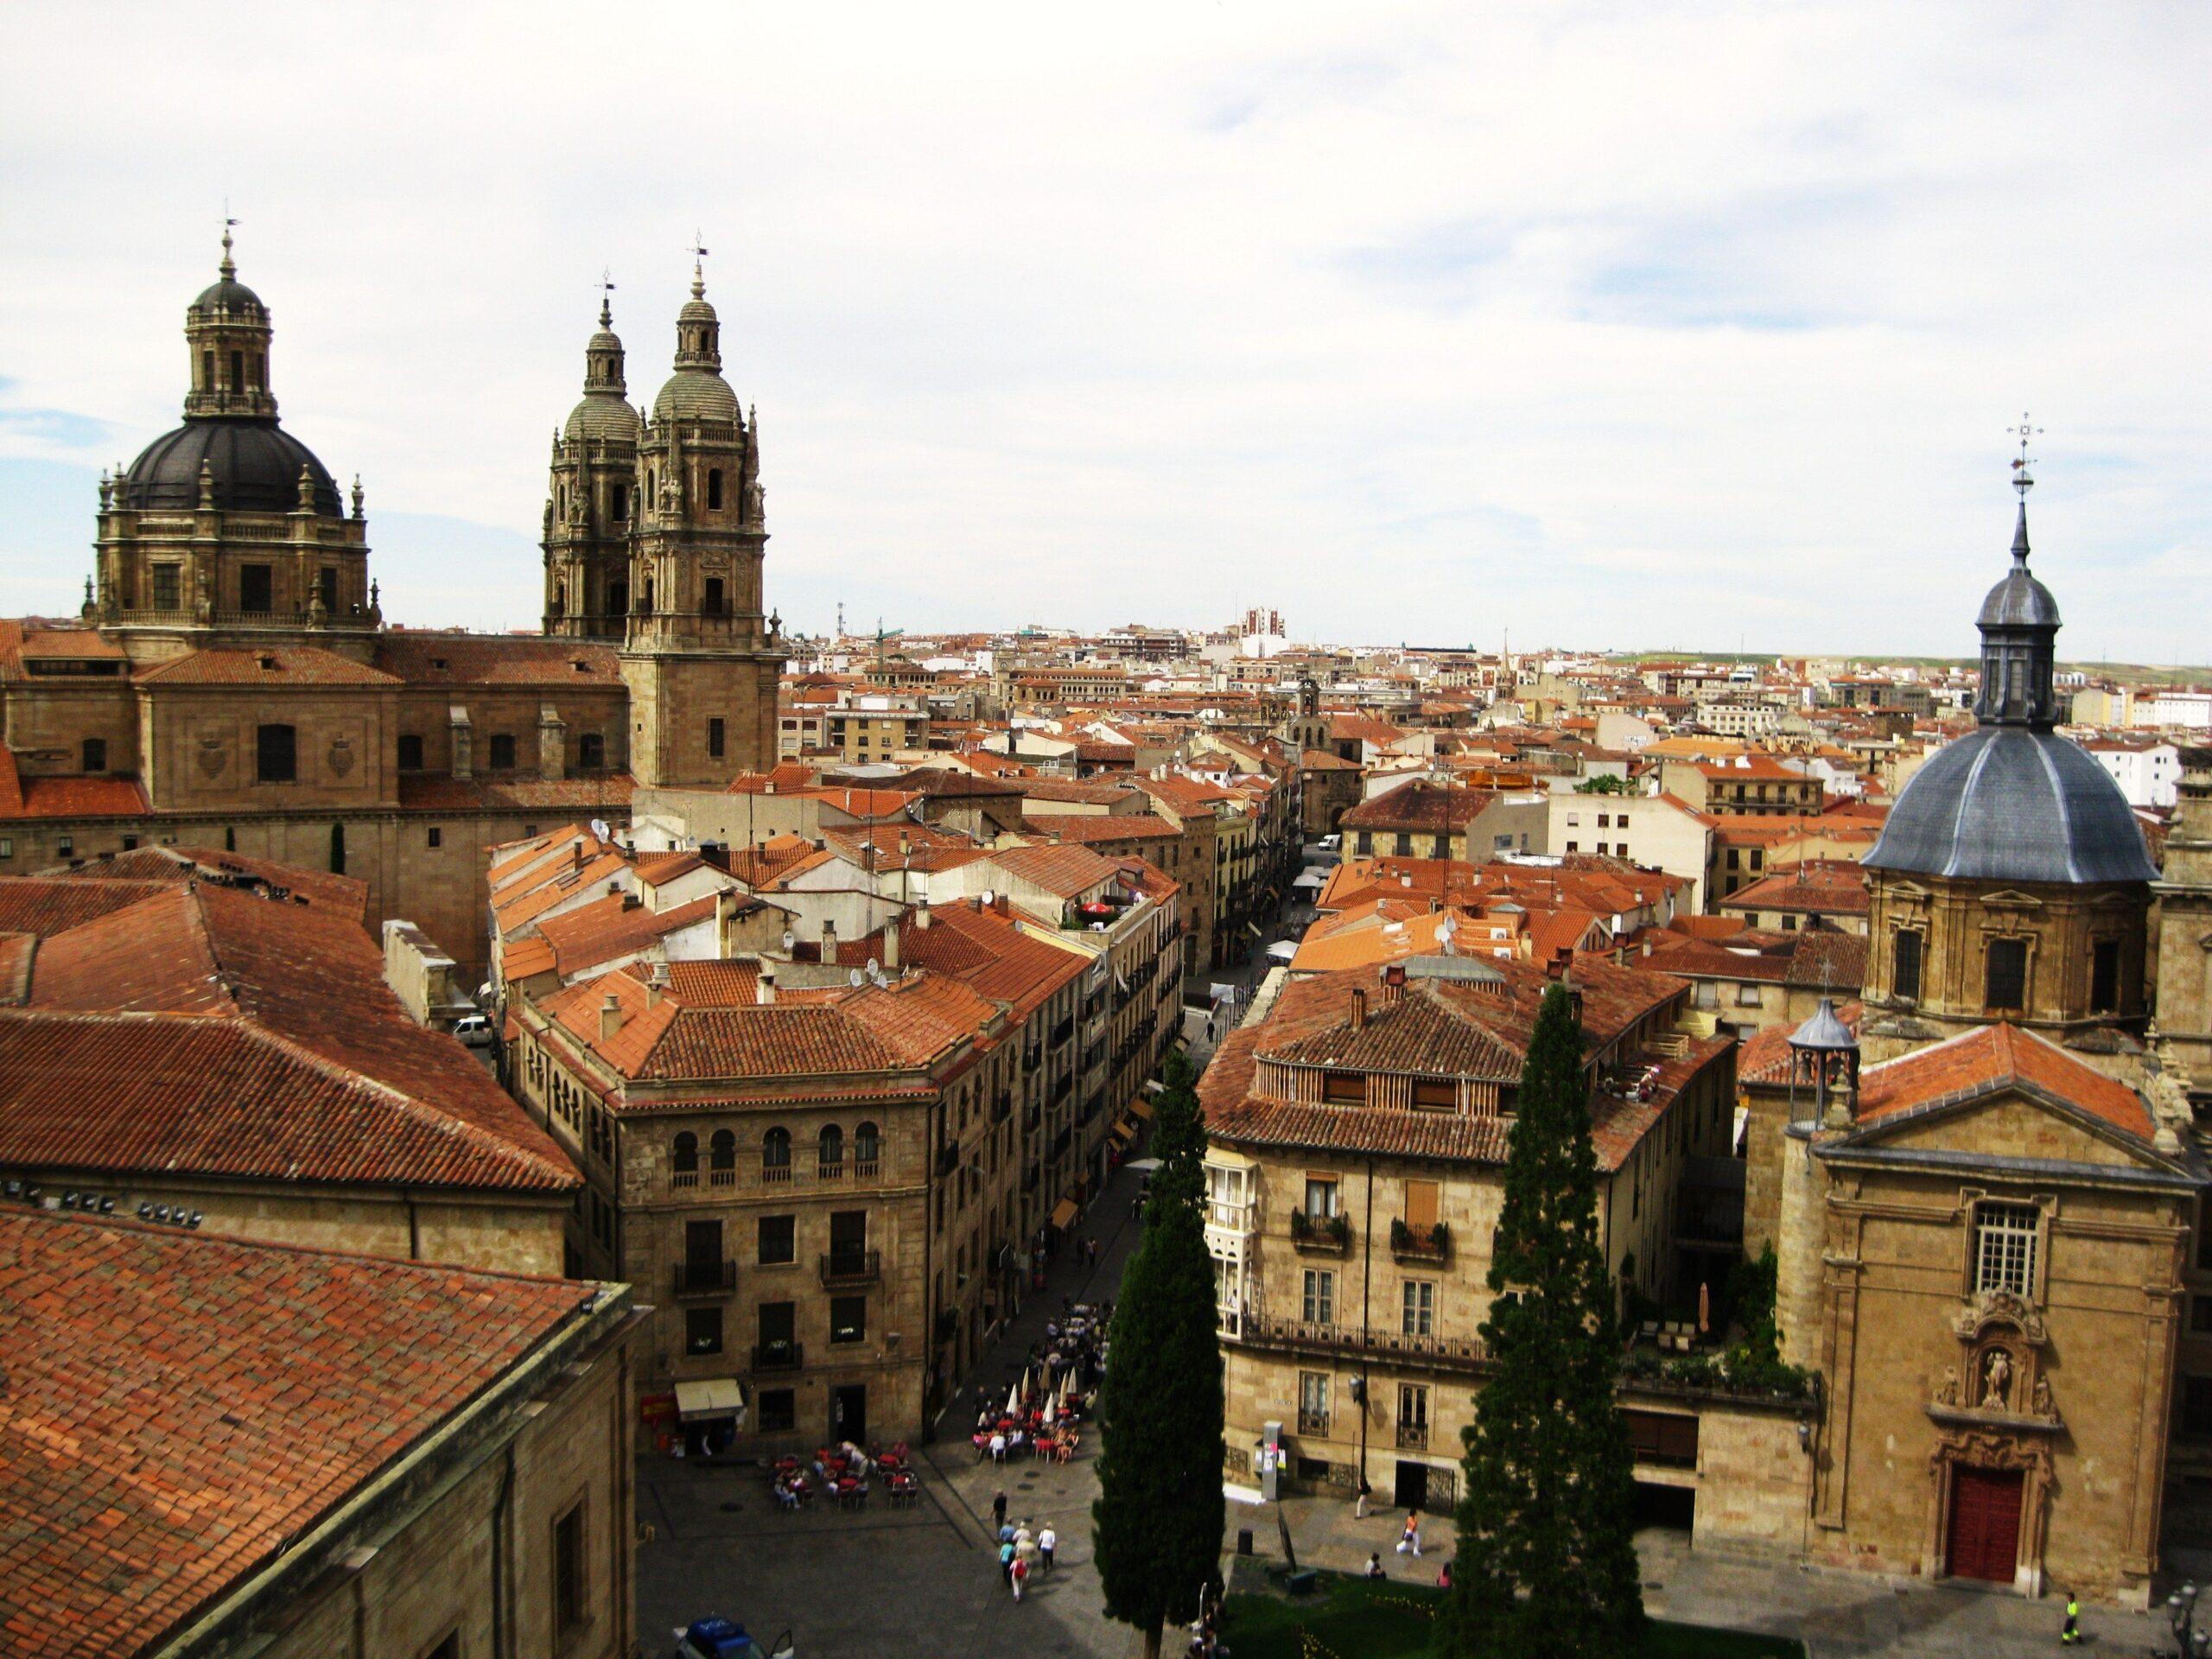 Fondos de Salamanca